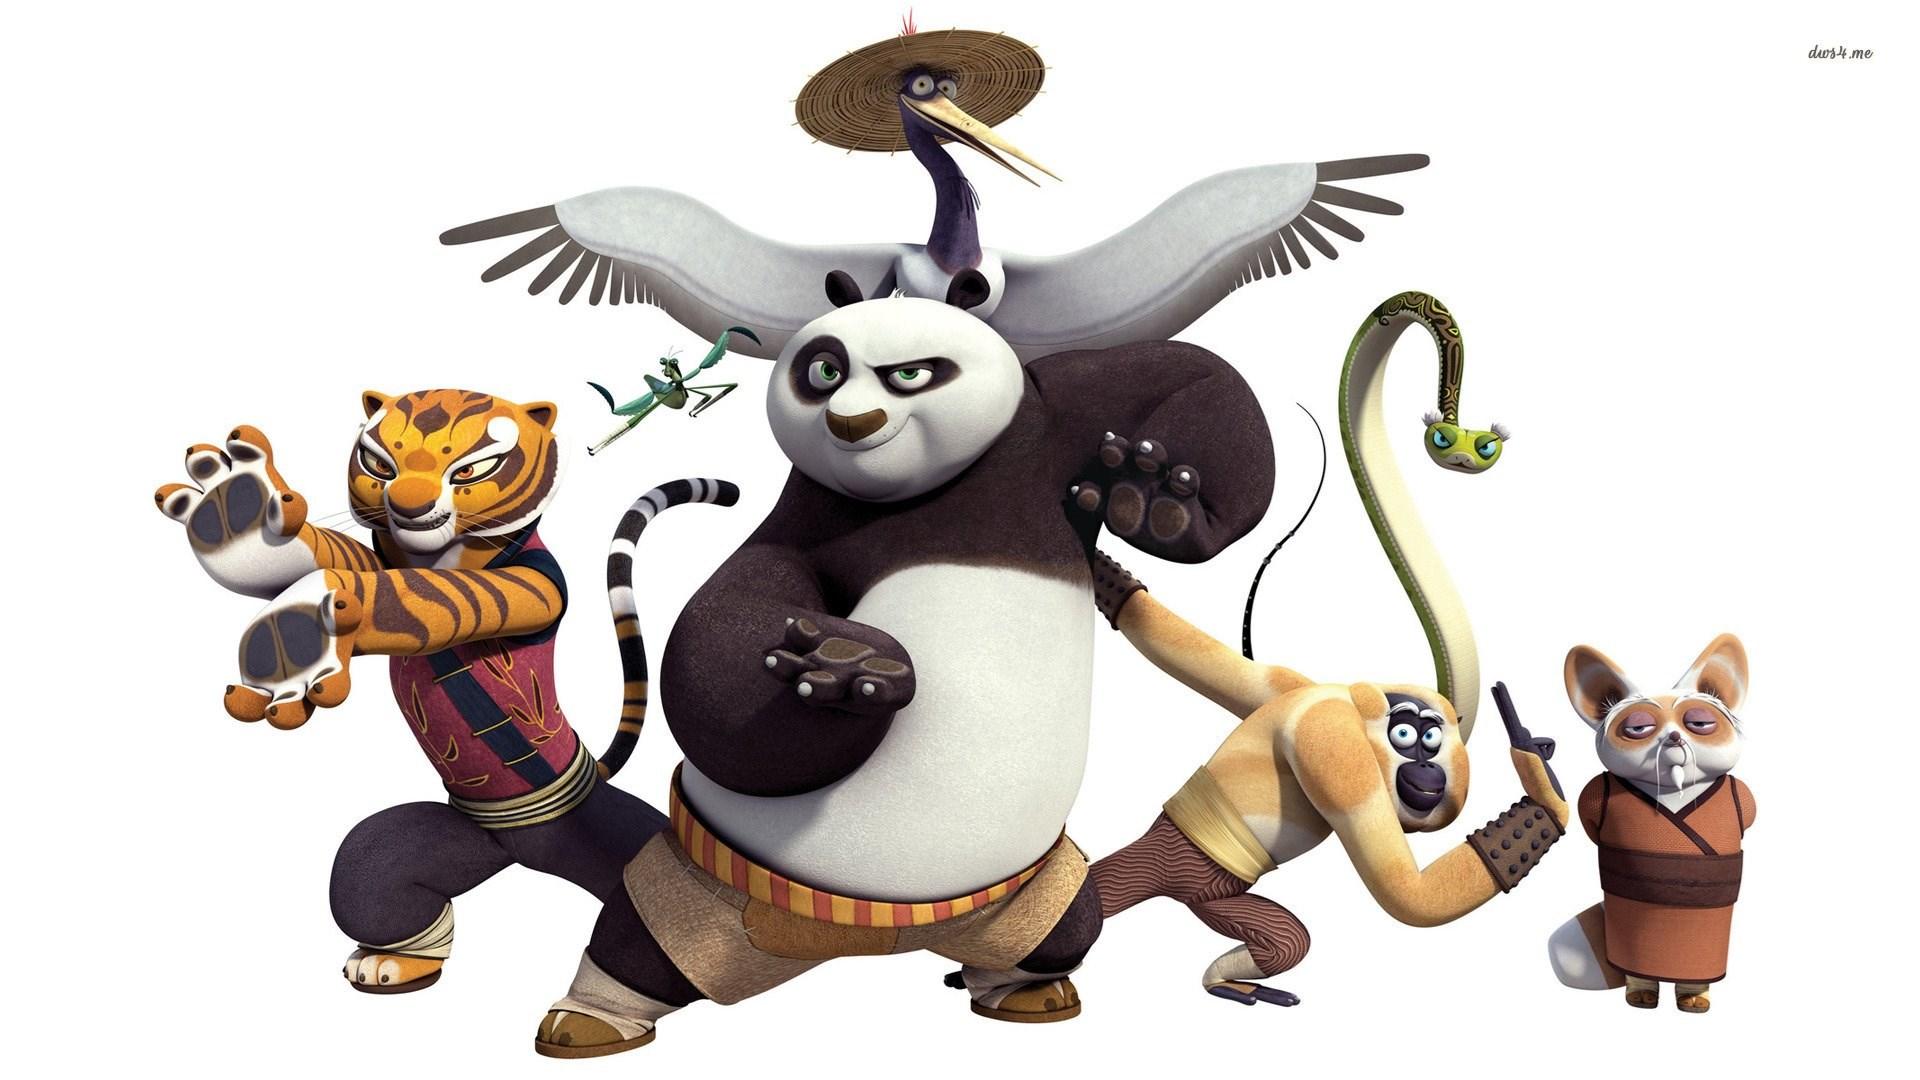 kung fu panda, po, monkey, tigress, master shifu, viper, crane